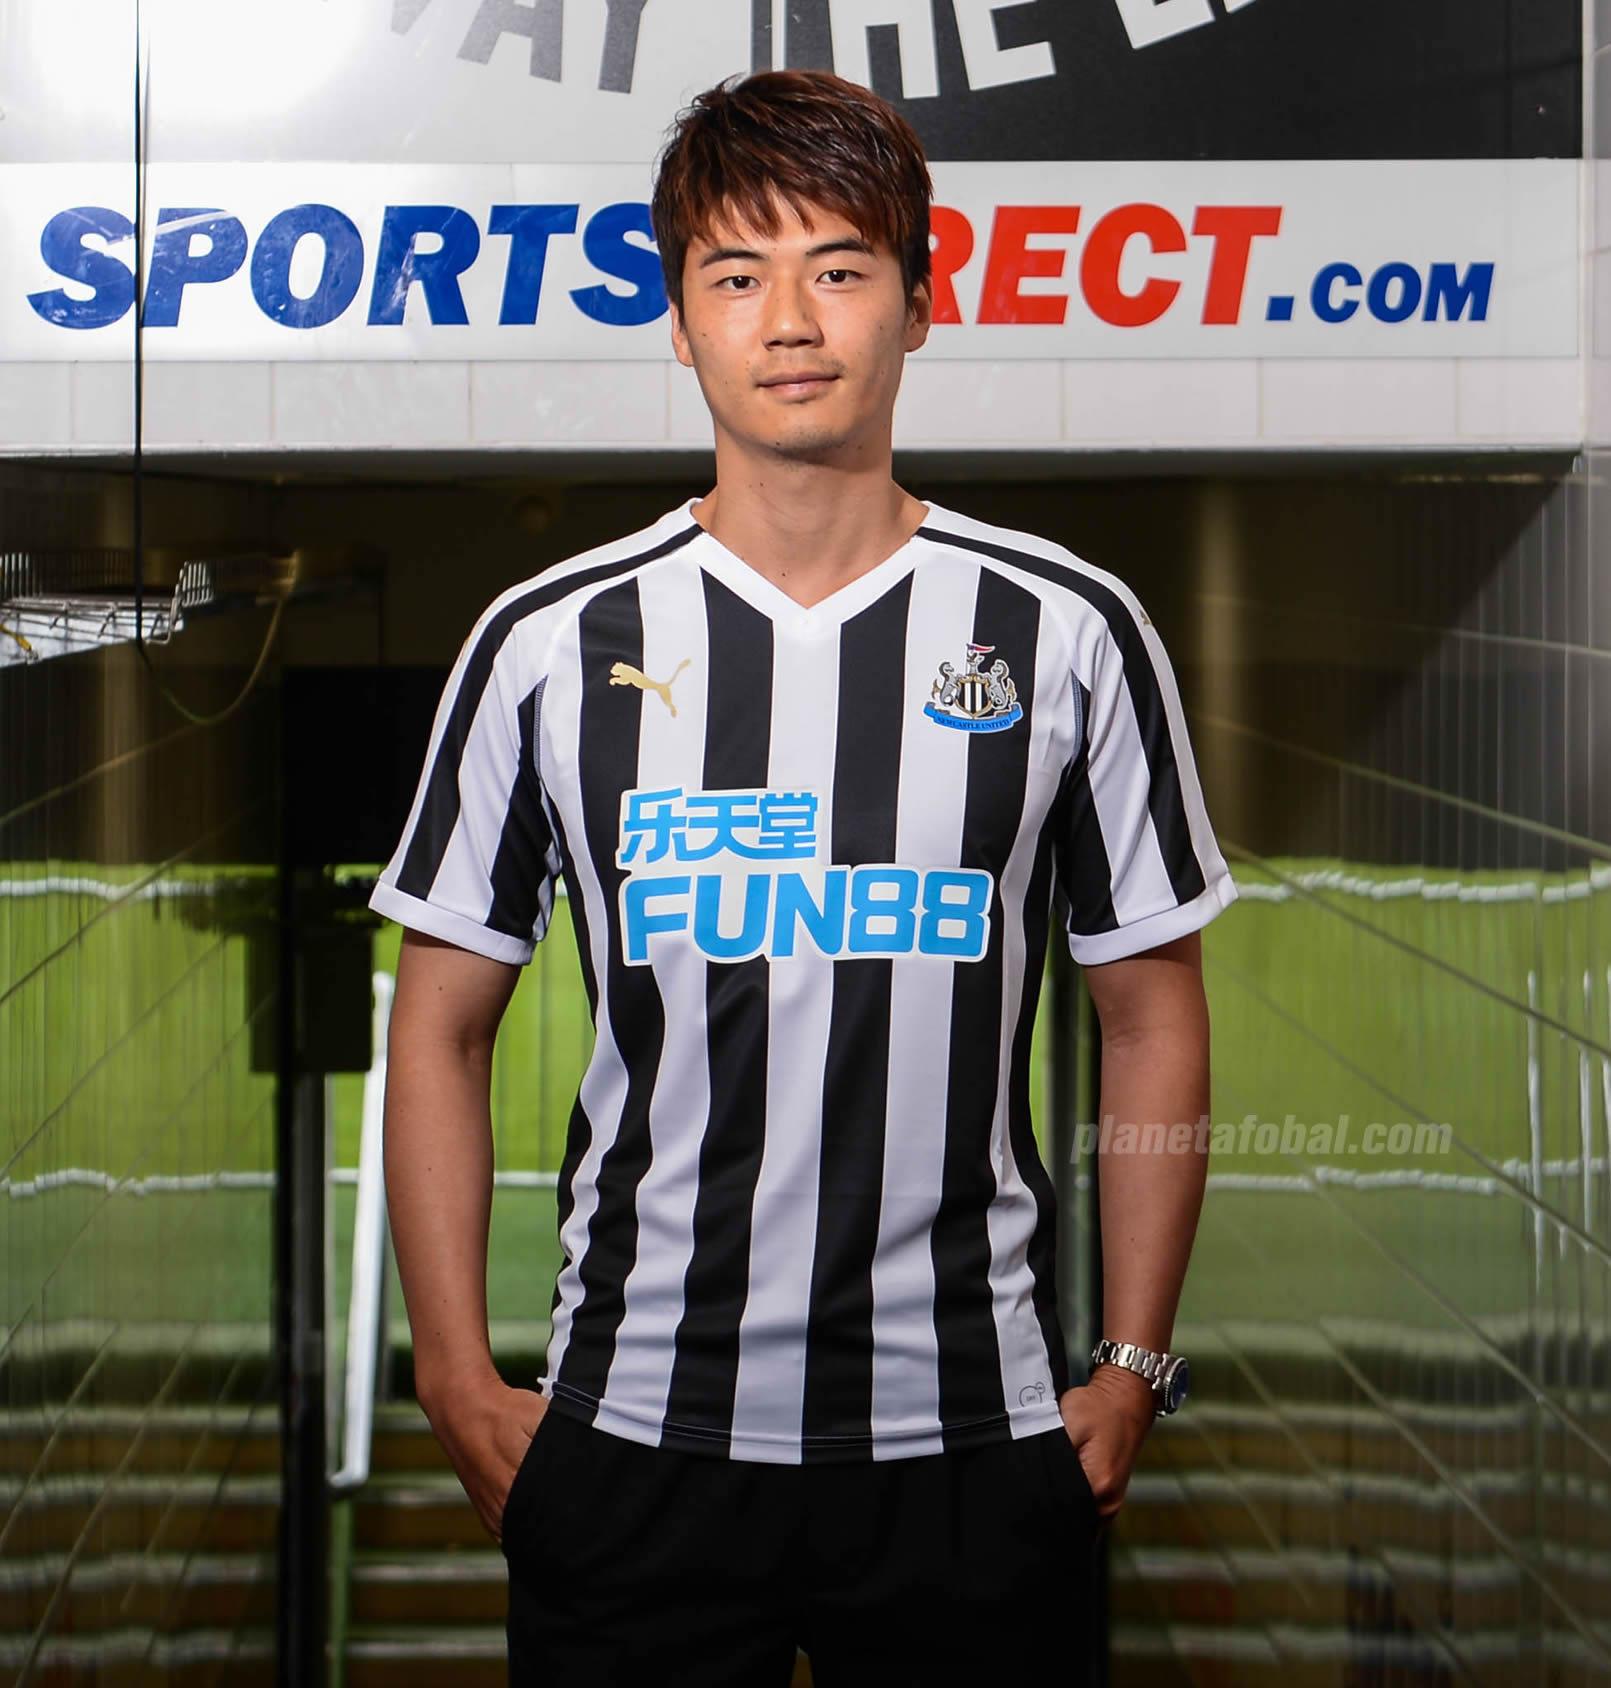 Camiseta titular Puma del Newcastle United 2018/2019 | Imagen Web Oficial